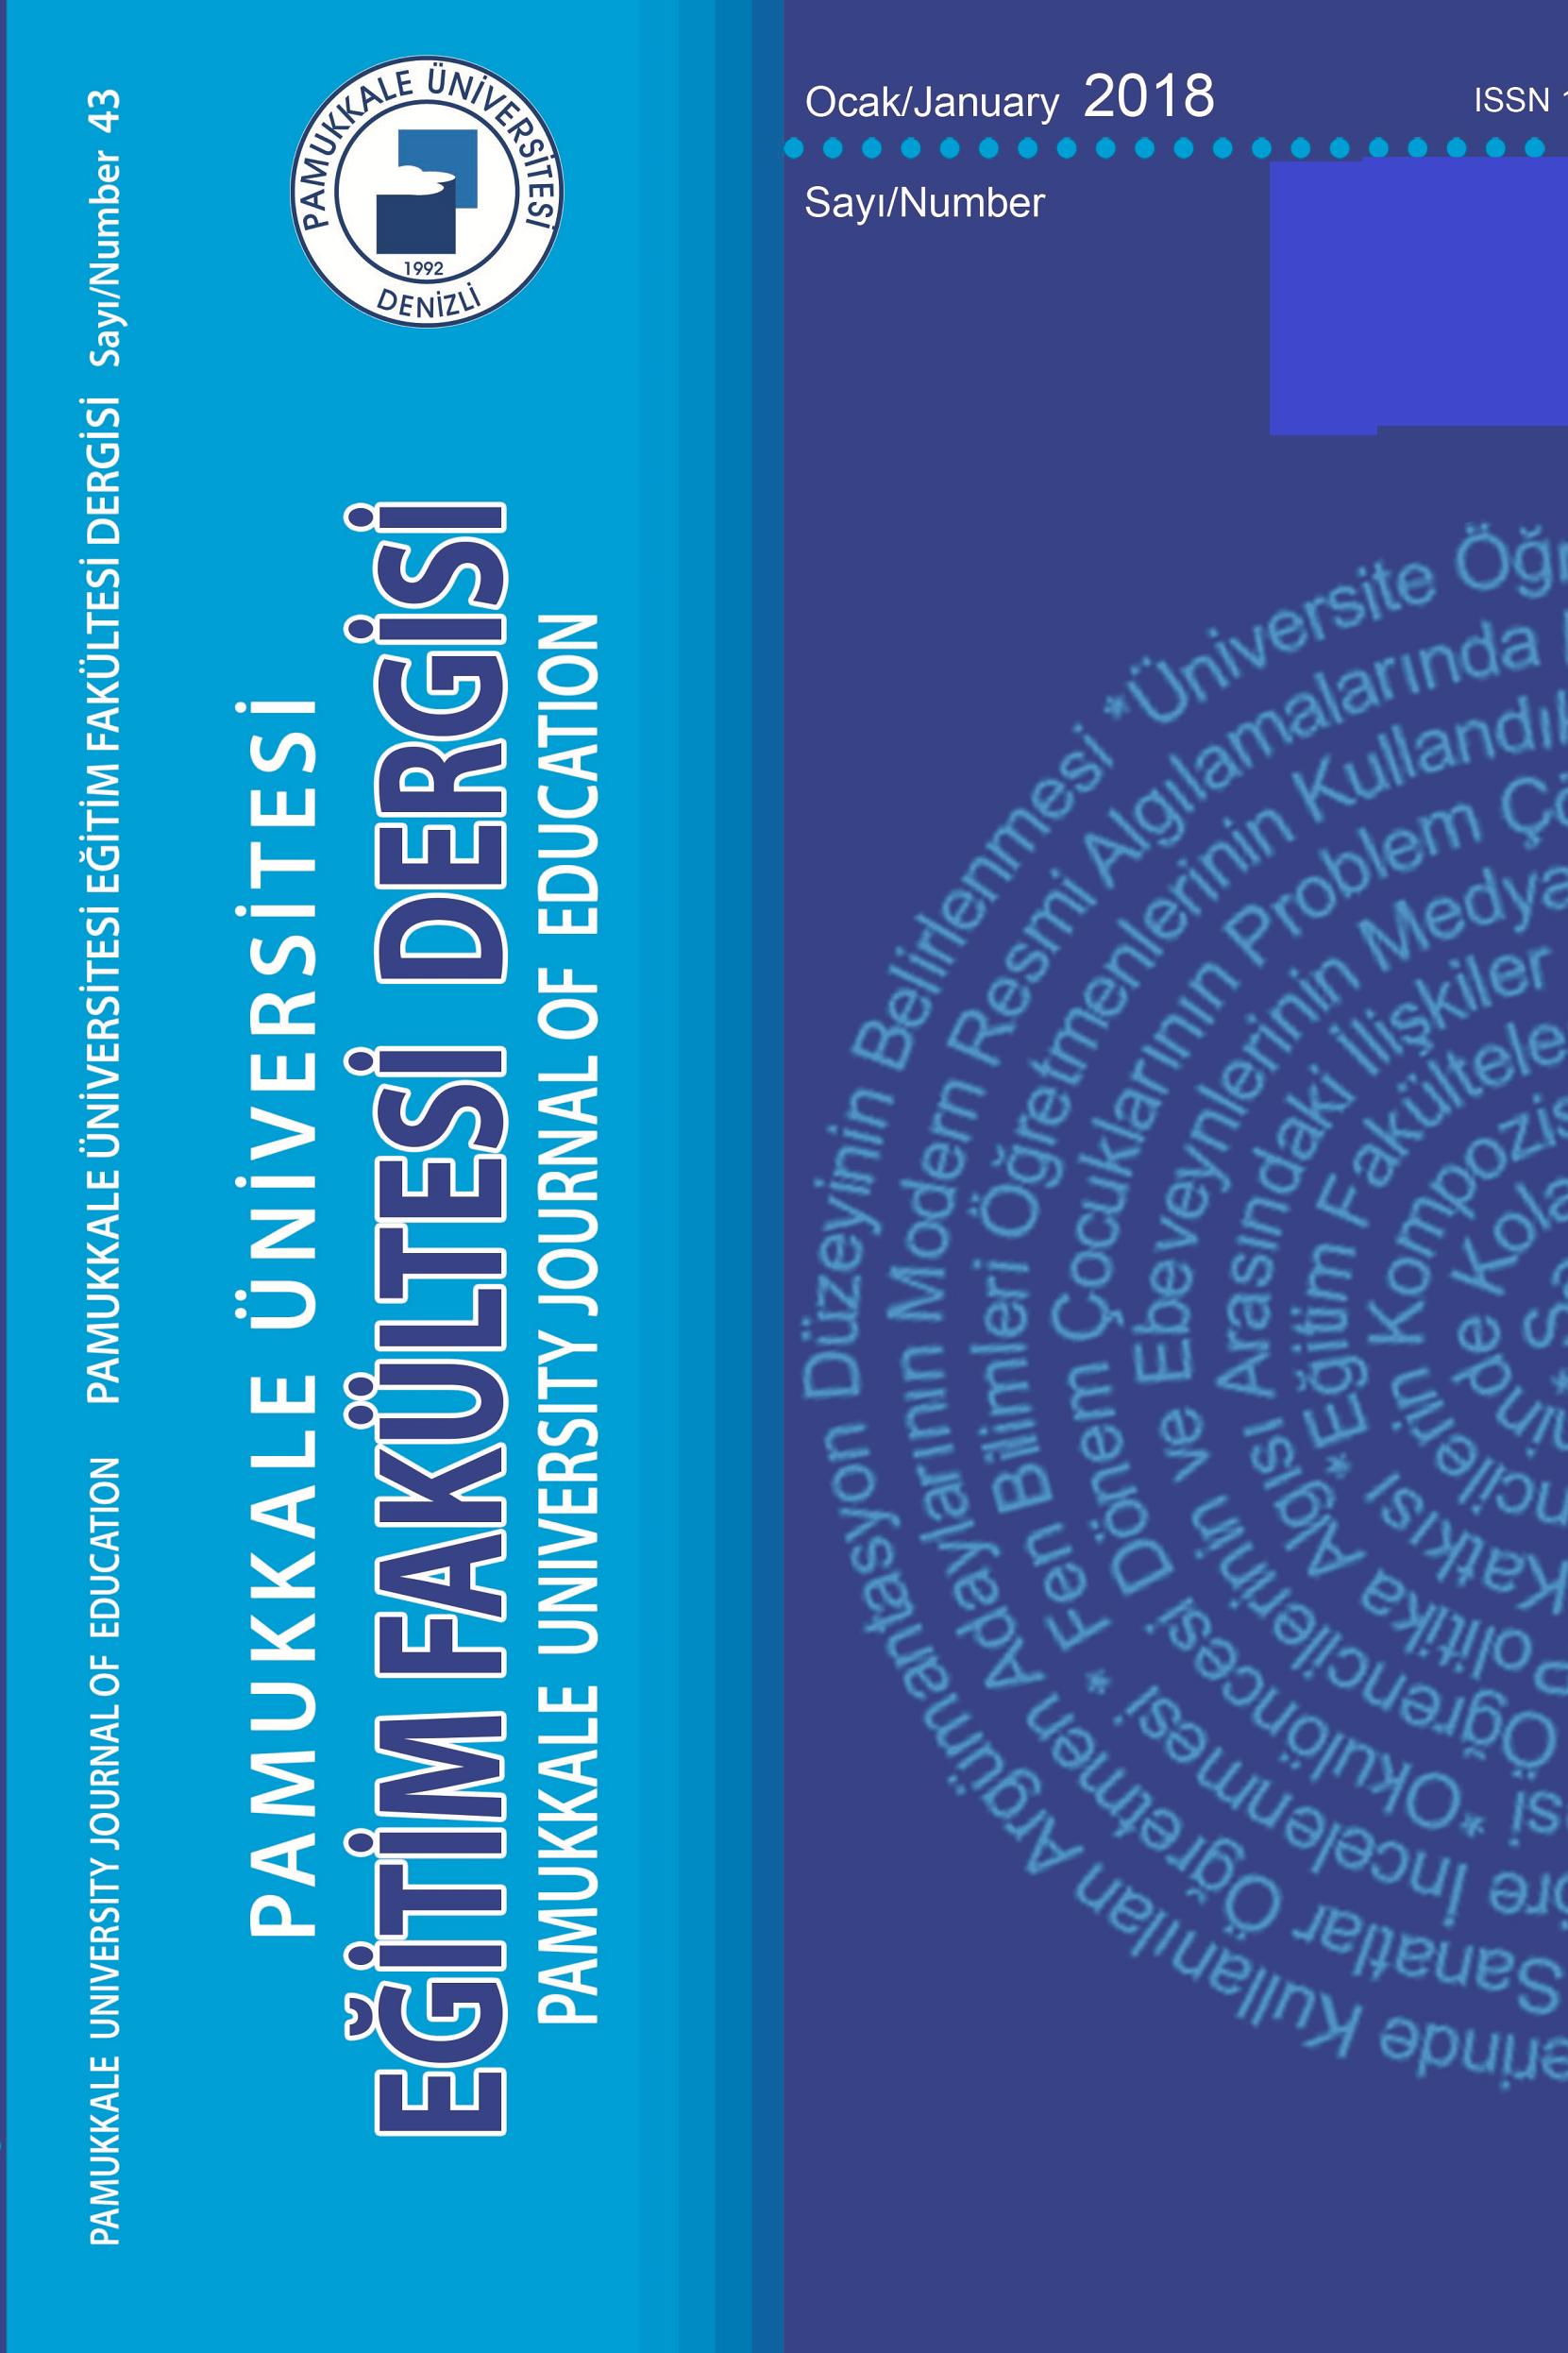 Pamukkale University Journal of Education